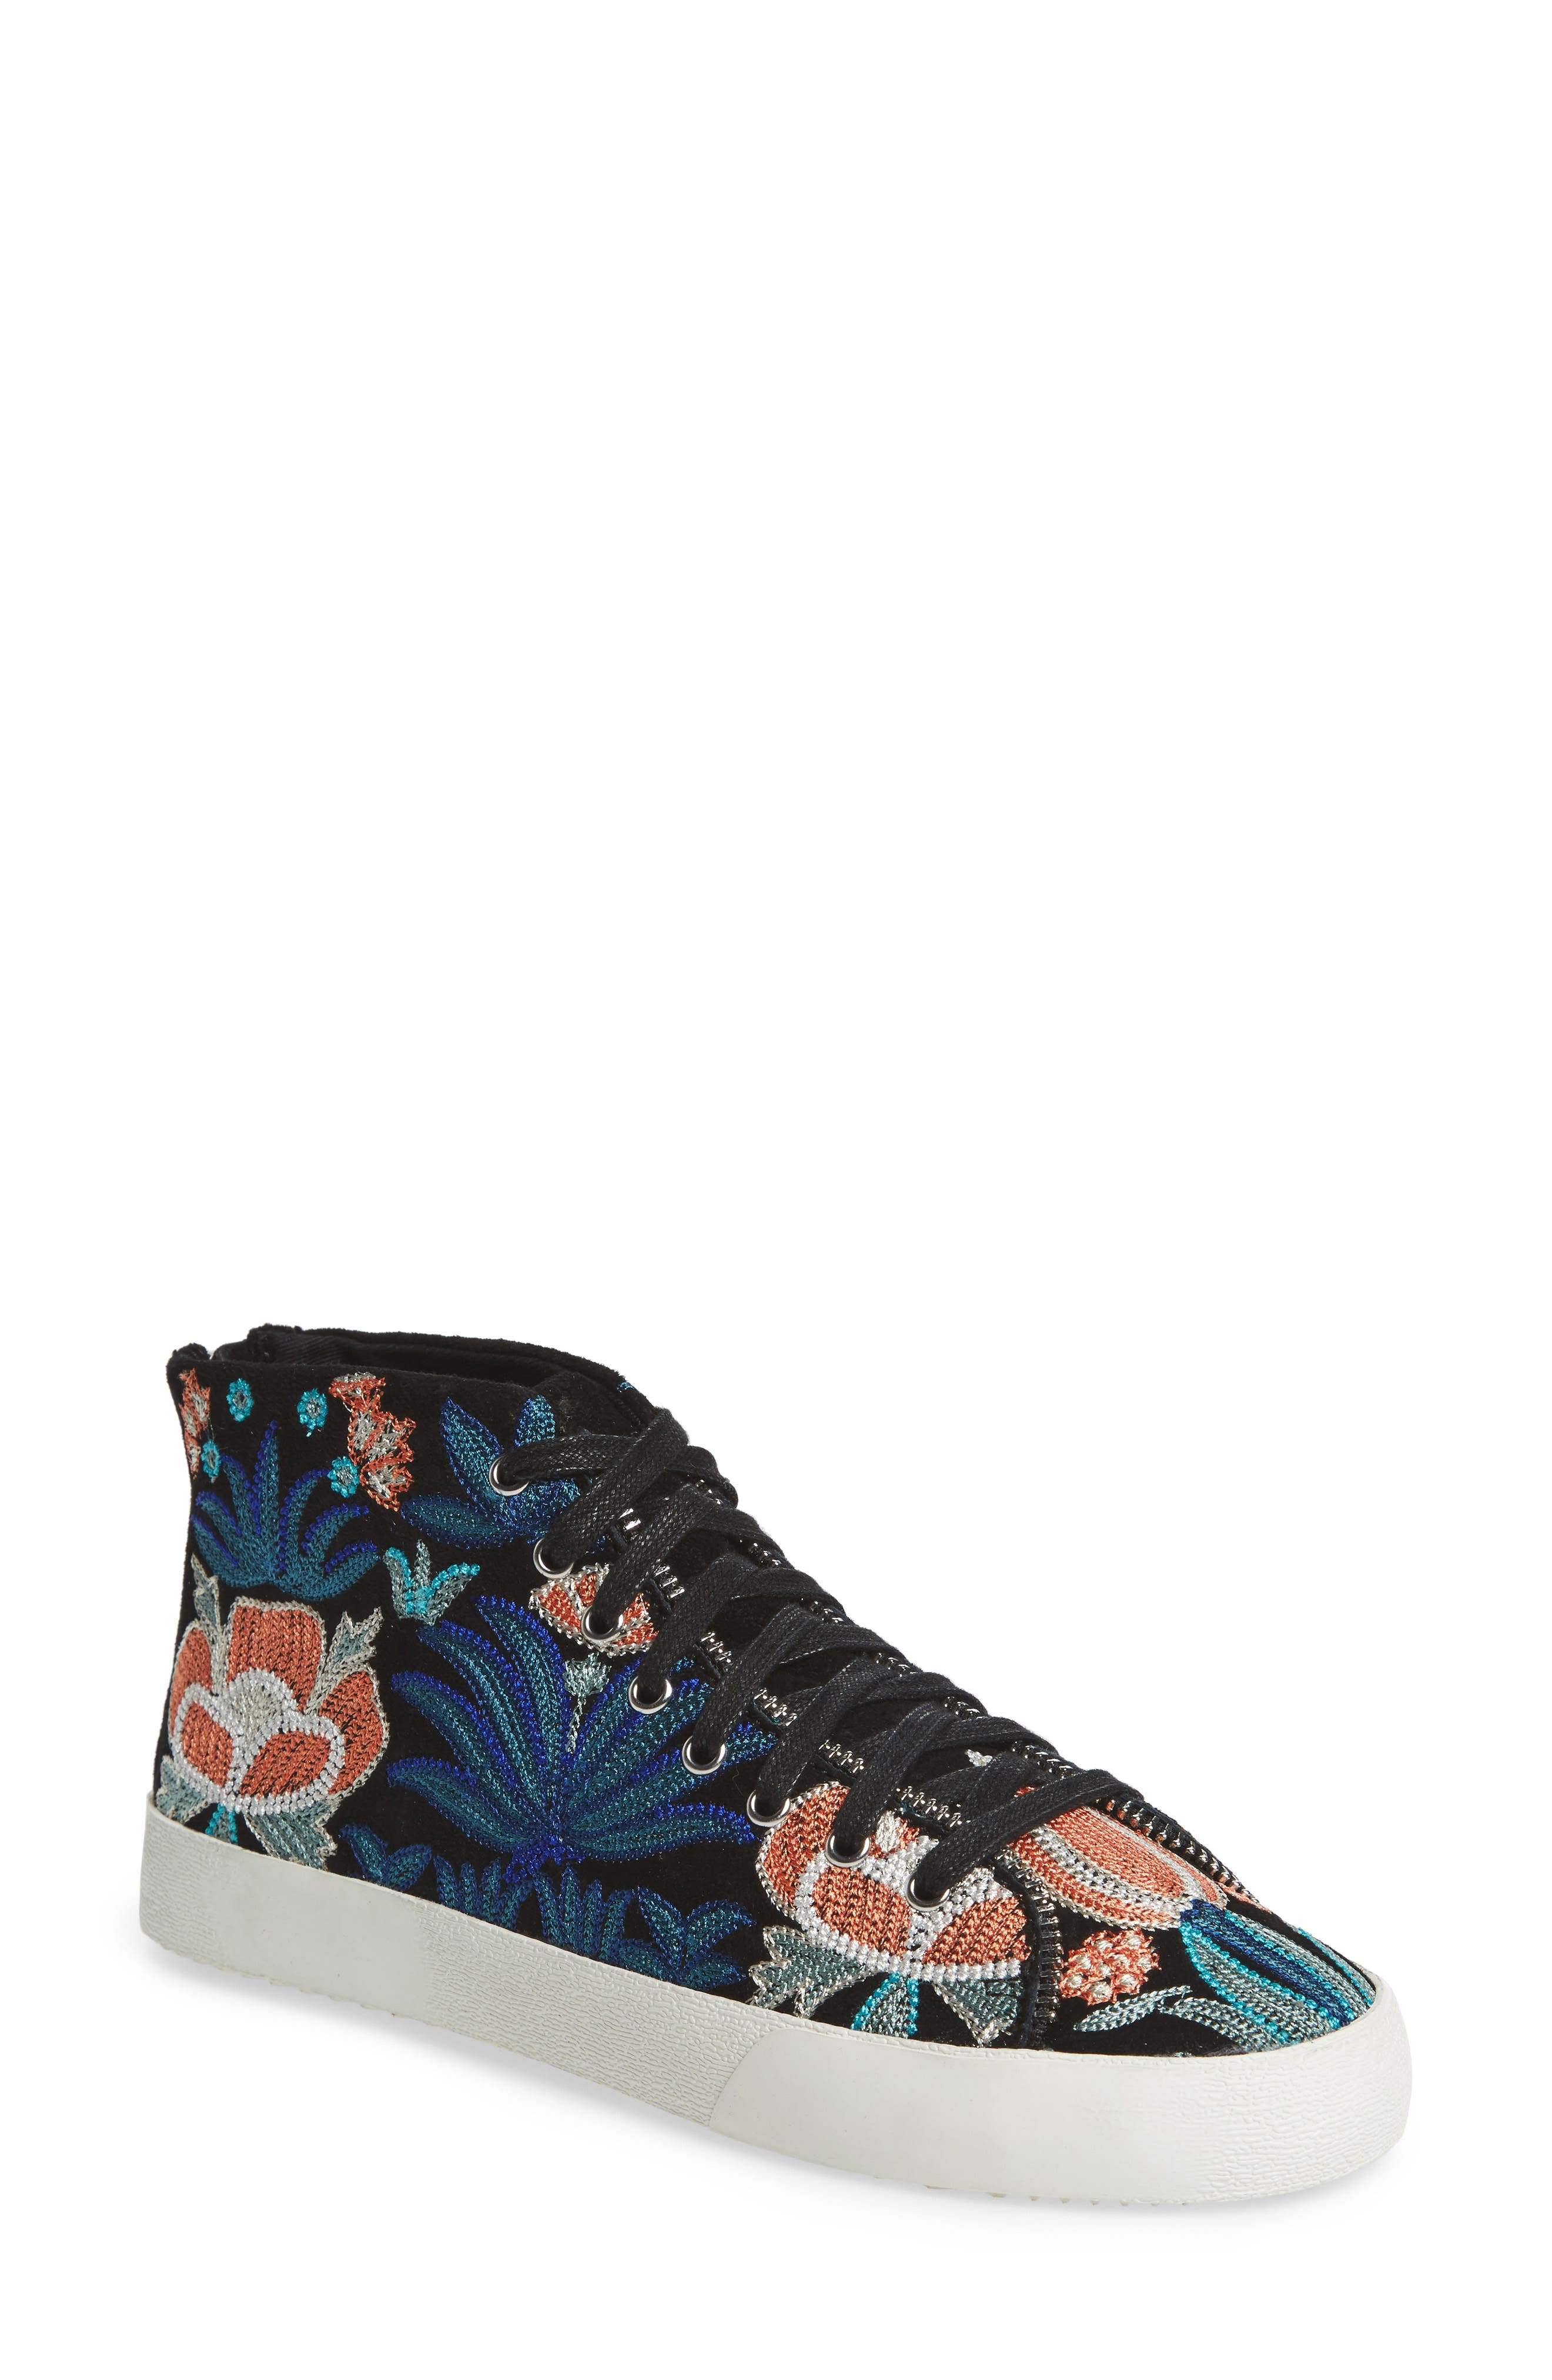 Zaina Embroidered Sneaker,                             Main thumbnail 1, color,                             004